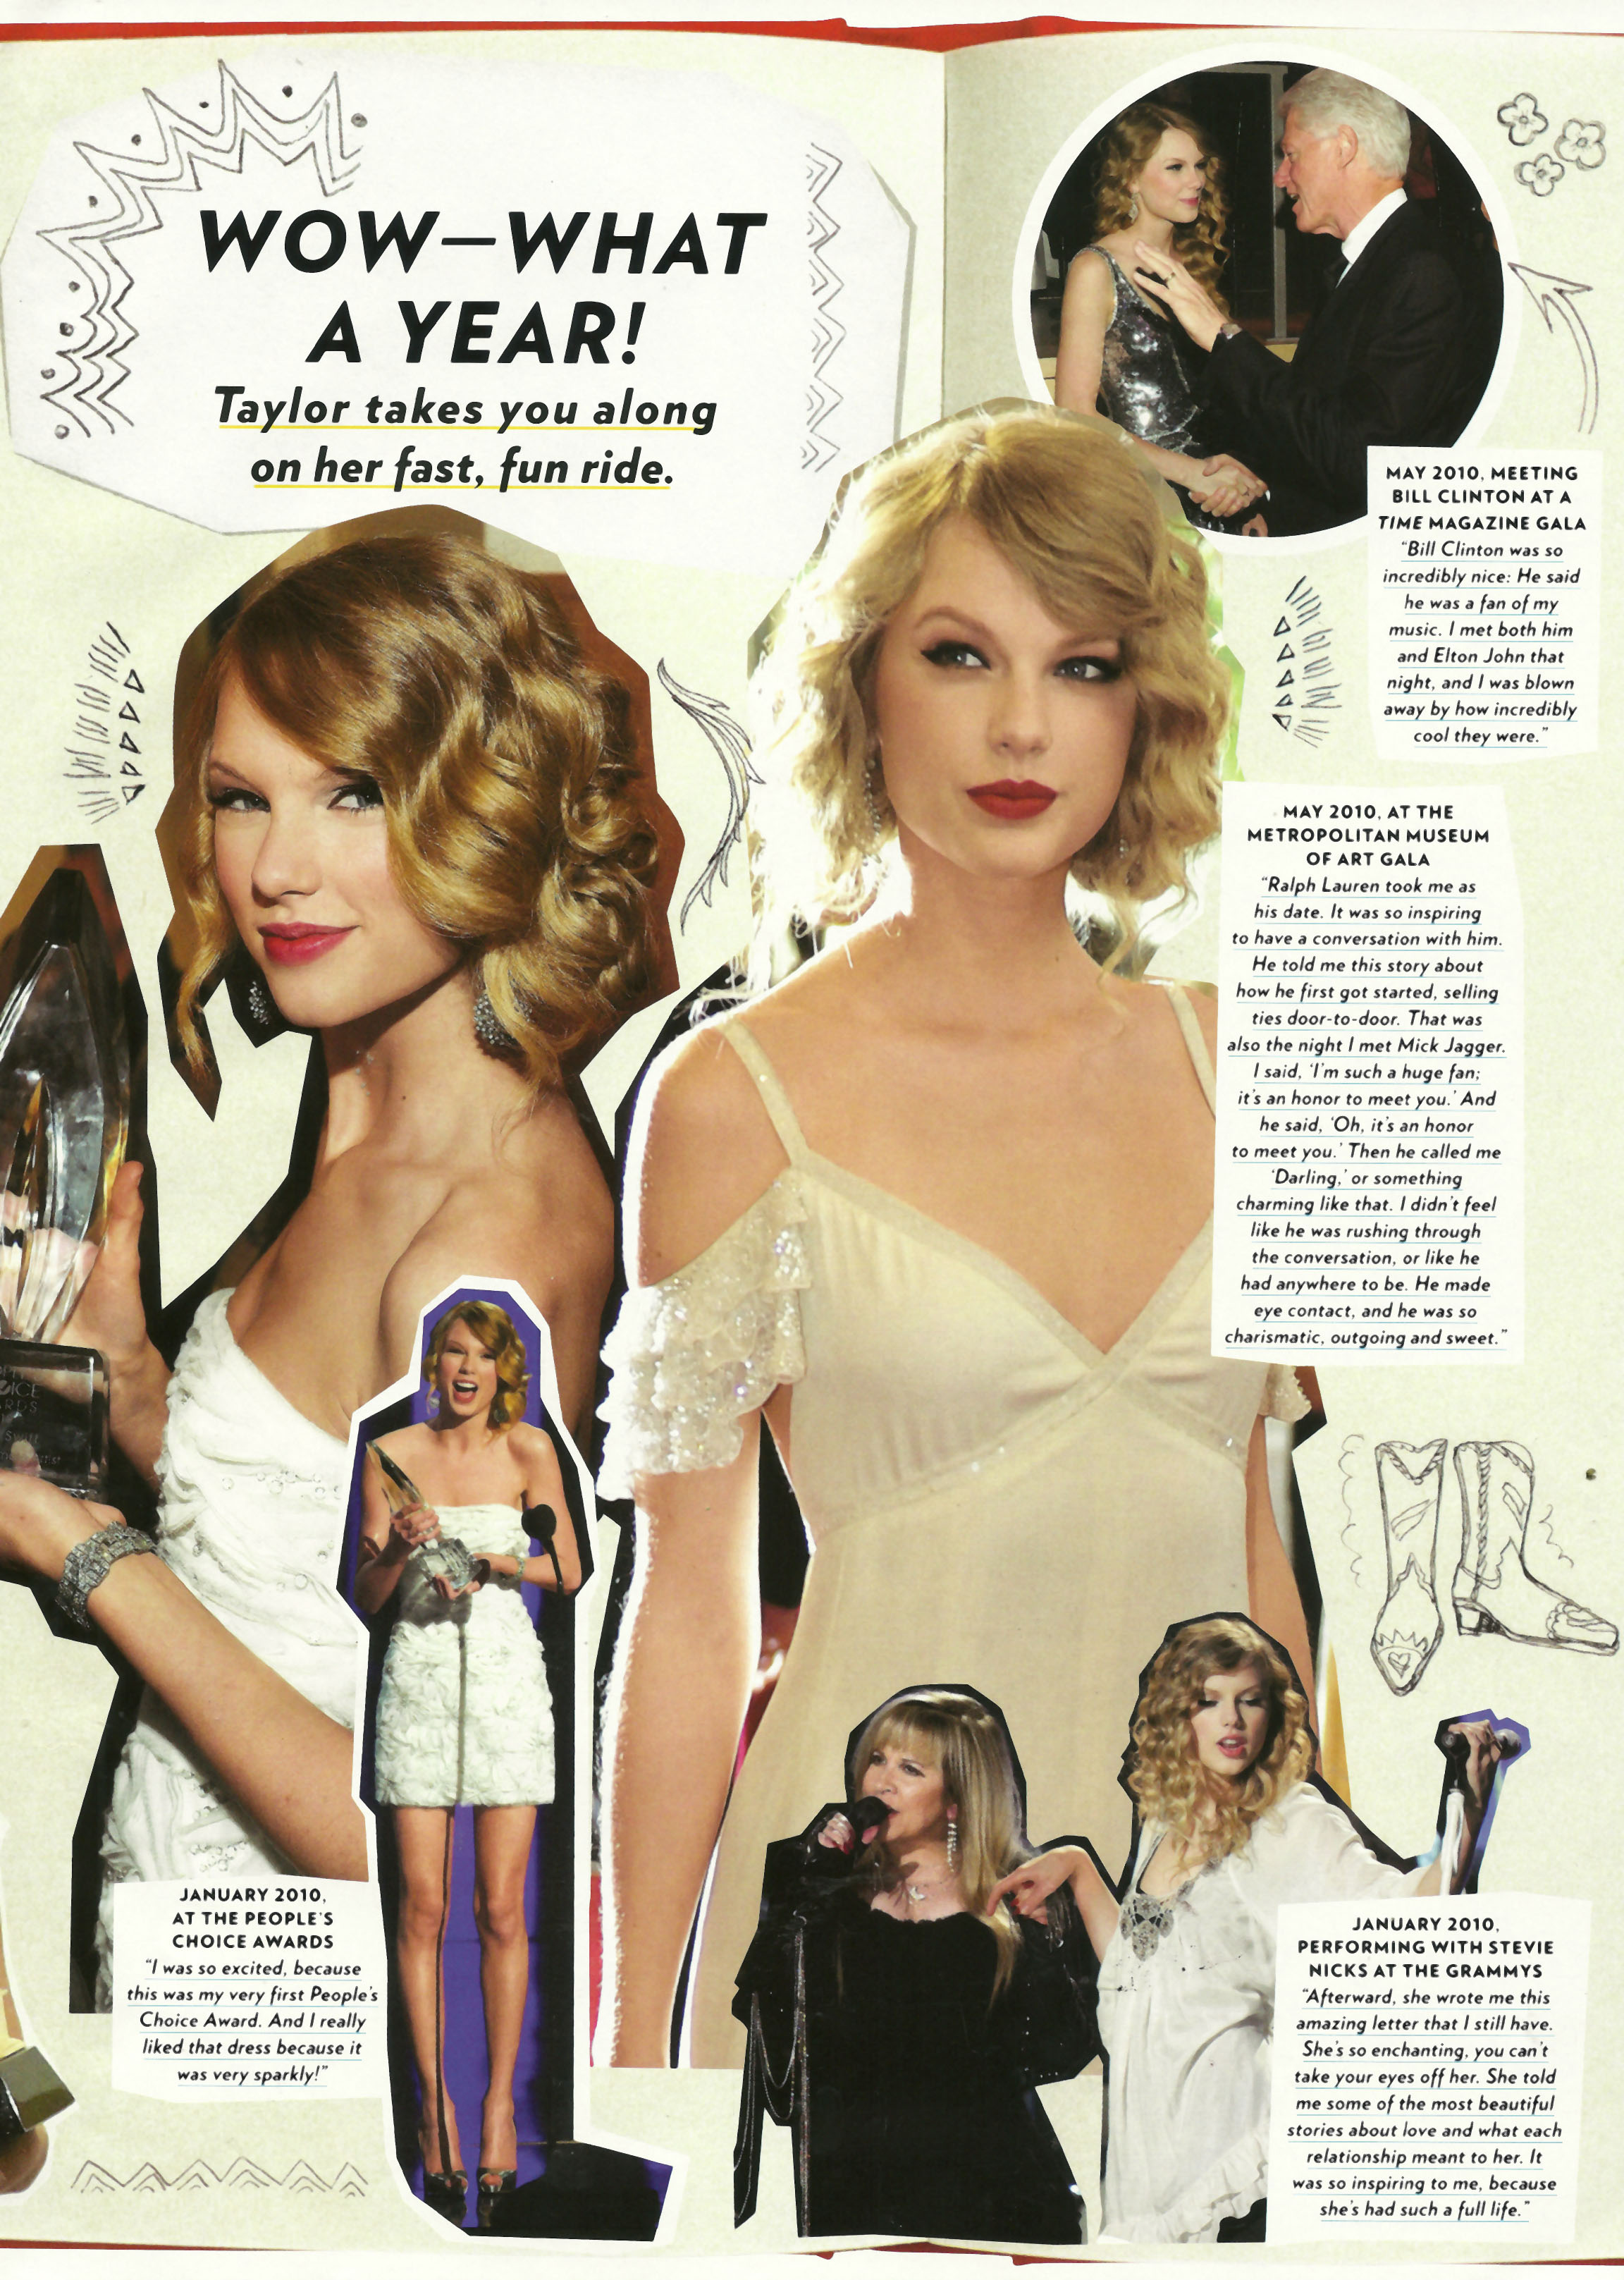 29363_Taylor_Dwift_2010_Glamour_Magazine_December_2010_11_122_591lo.jpg